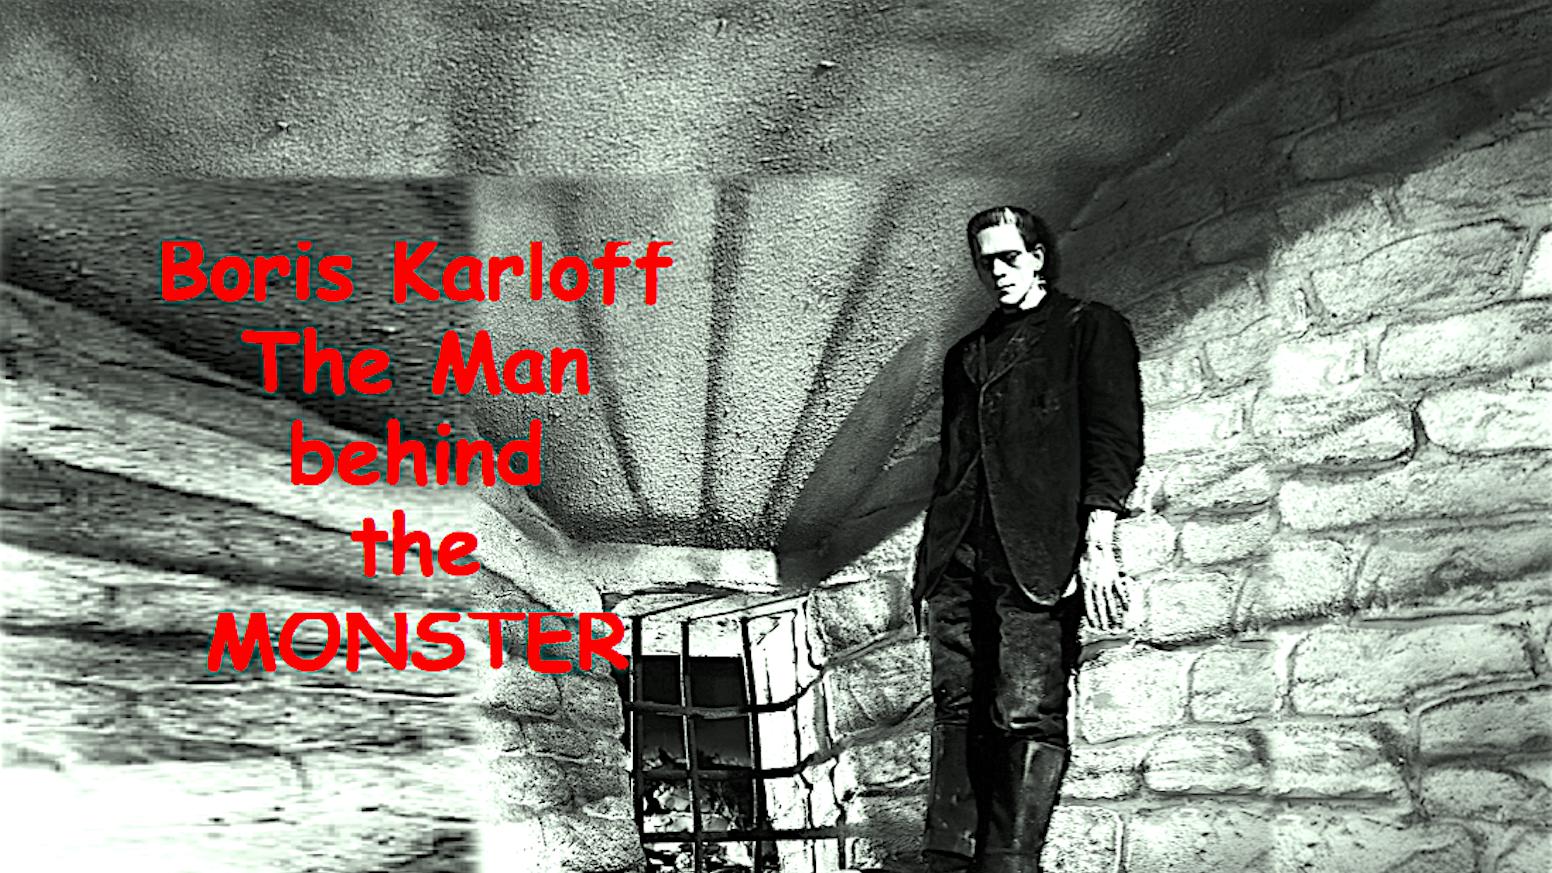 Boris Karloff: The Man Behind the Monster by Thomas Hamilton